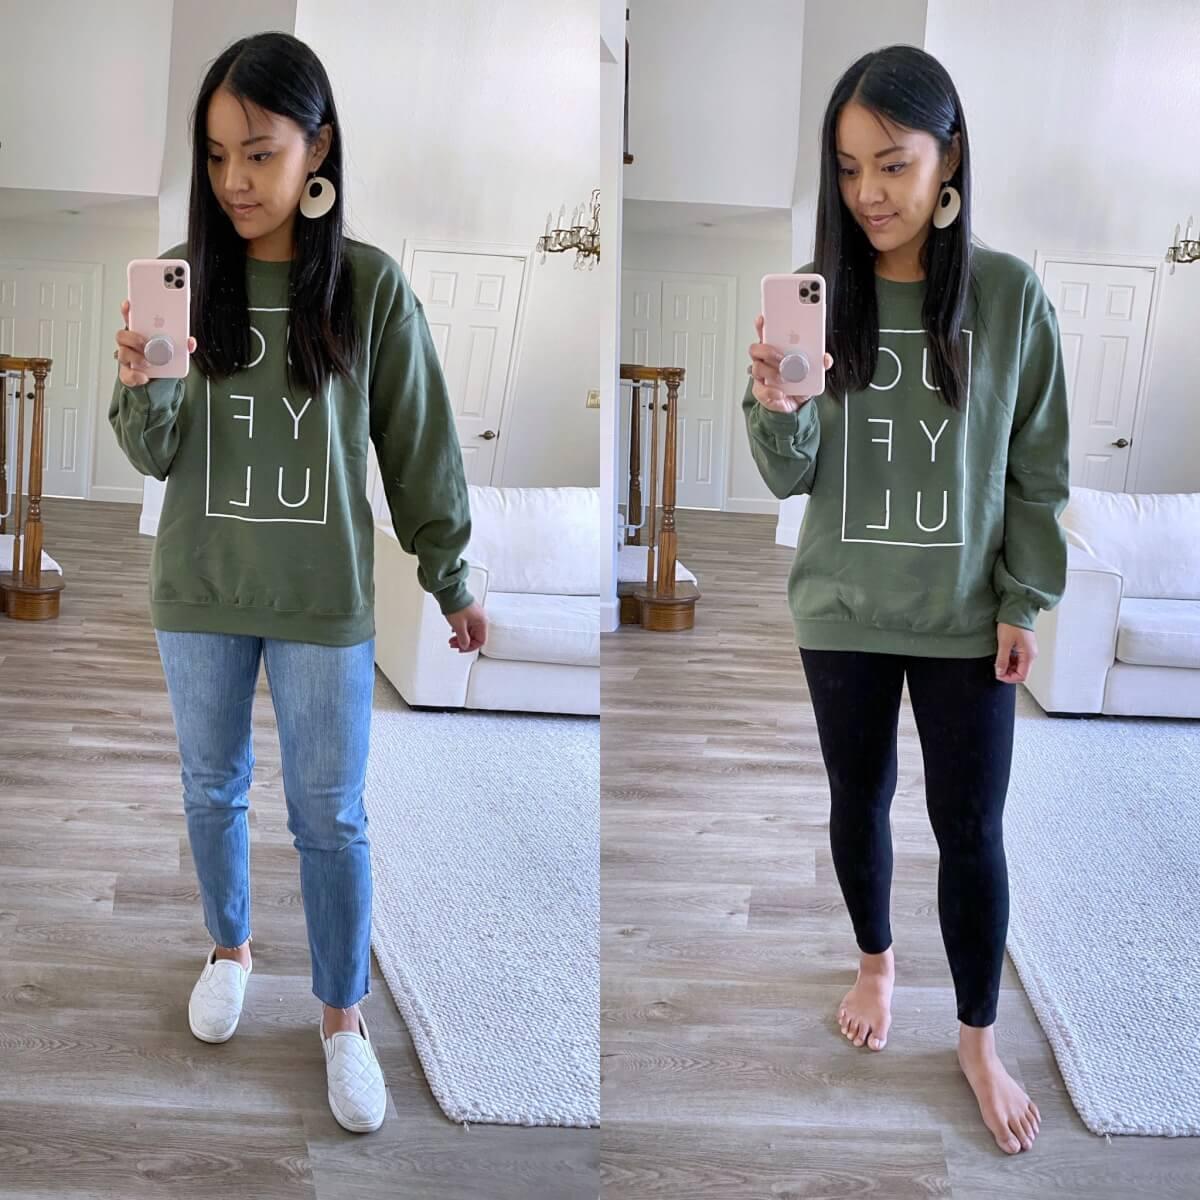 Casual Outfit Early Fall: green joyful sweatshirt + light straight leg jeans + white slip-on sneakers + white earrings + black leggings